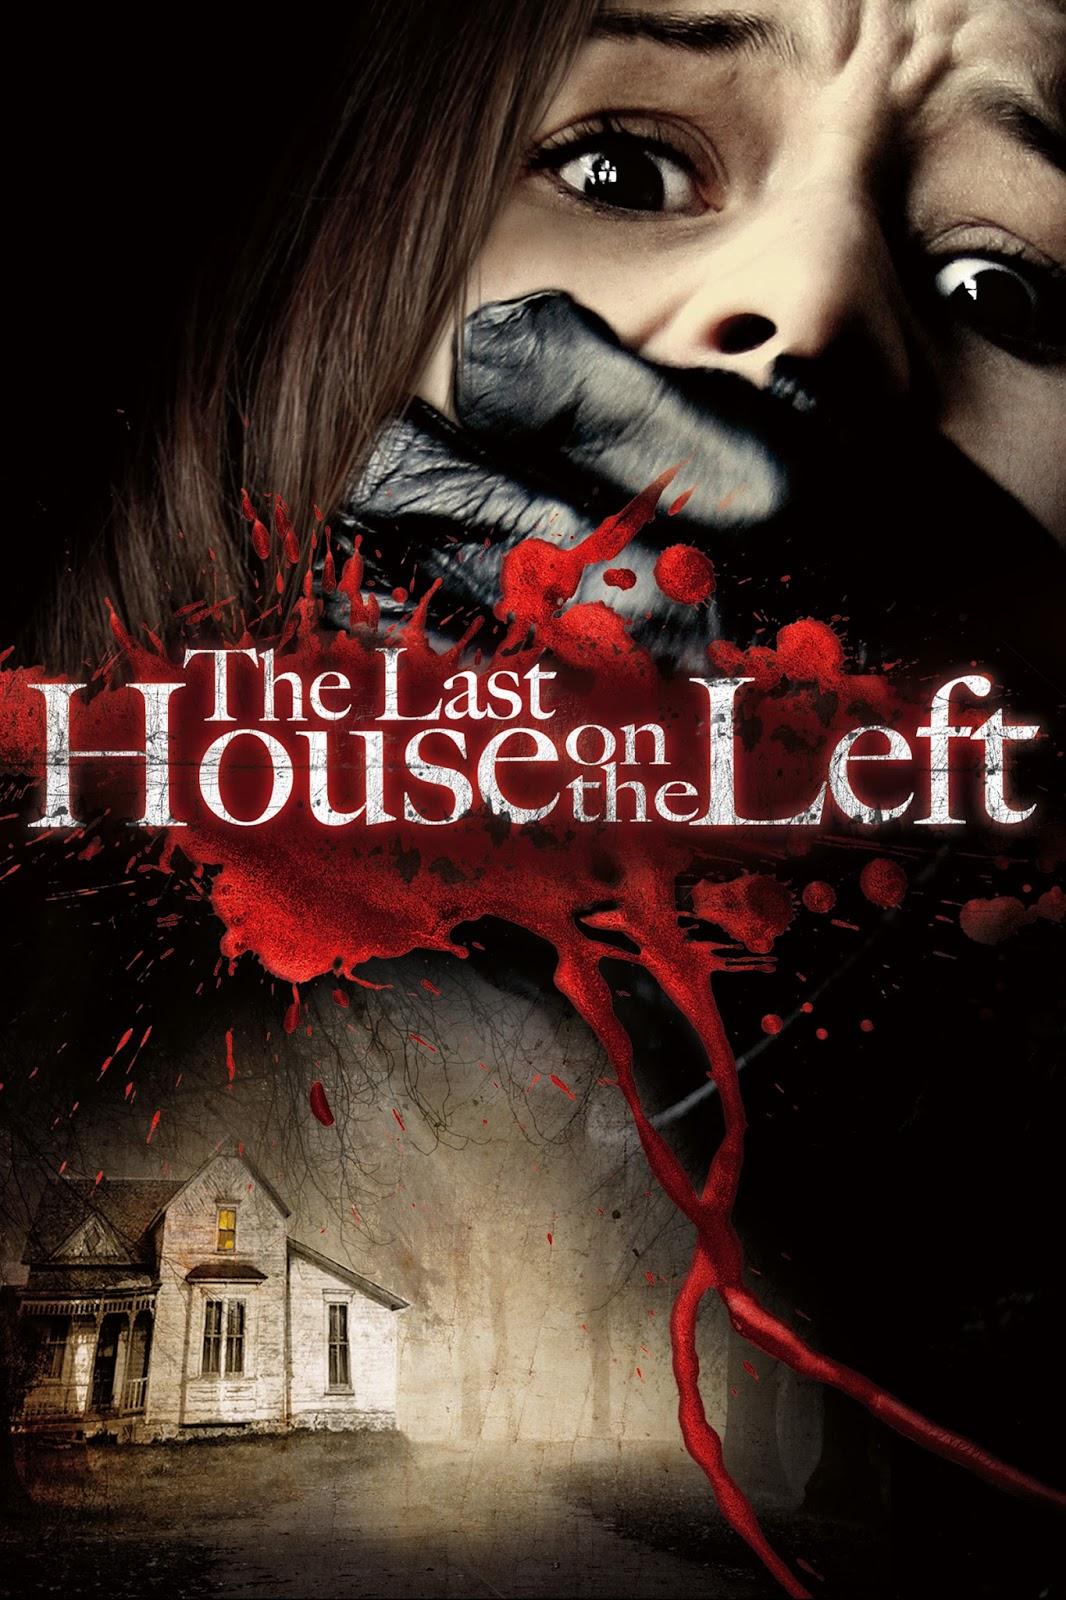 The Last House on the Left (1972) โหดชั่วมนุษย์เดนคน